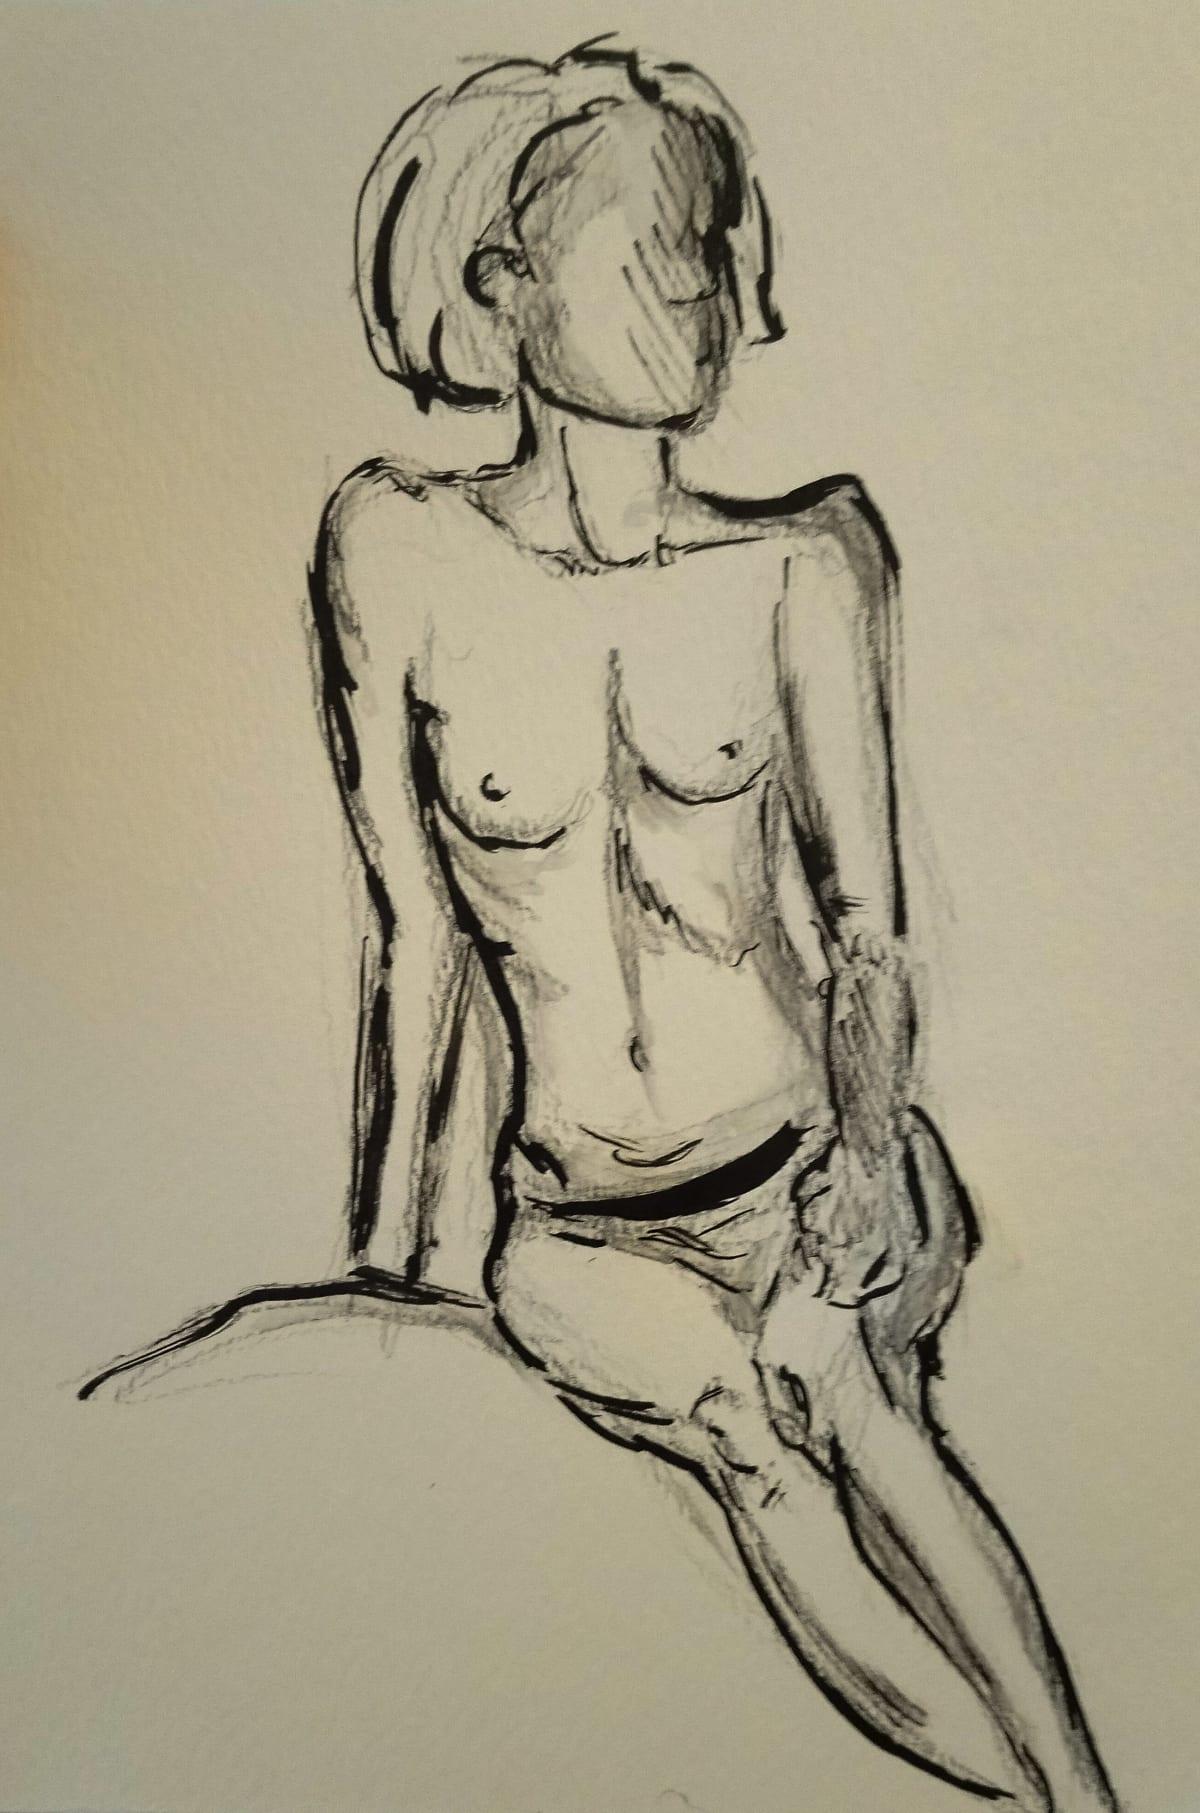 Loreal Vos, Life Drawing II, 2018